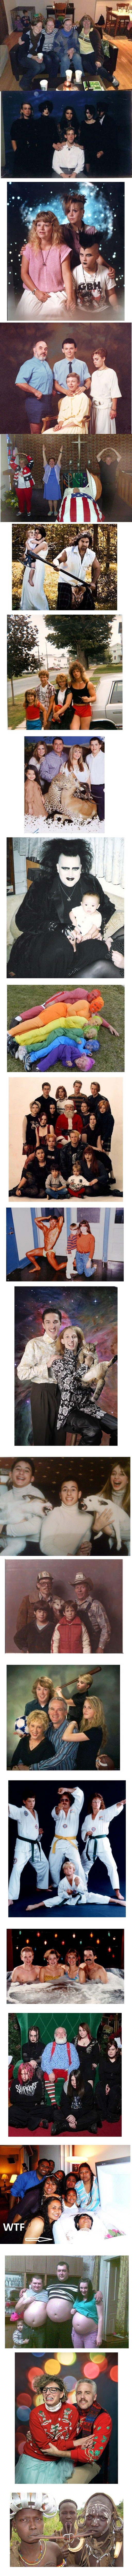 awkward family photos. .. thats actually pretty cool